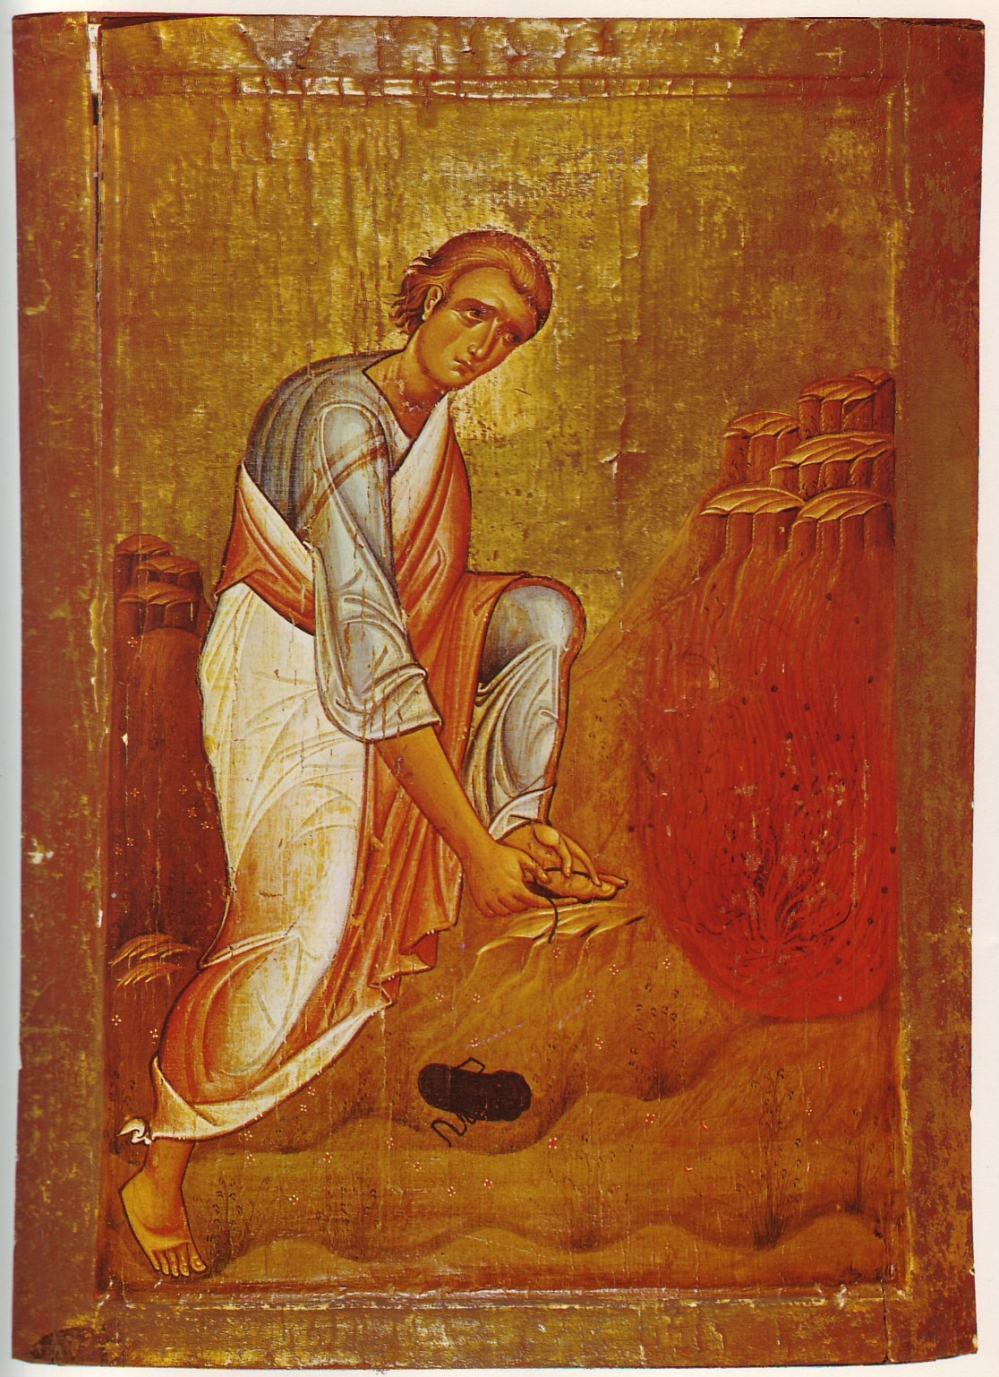 3rd Sunday of Lent, Year C